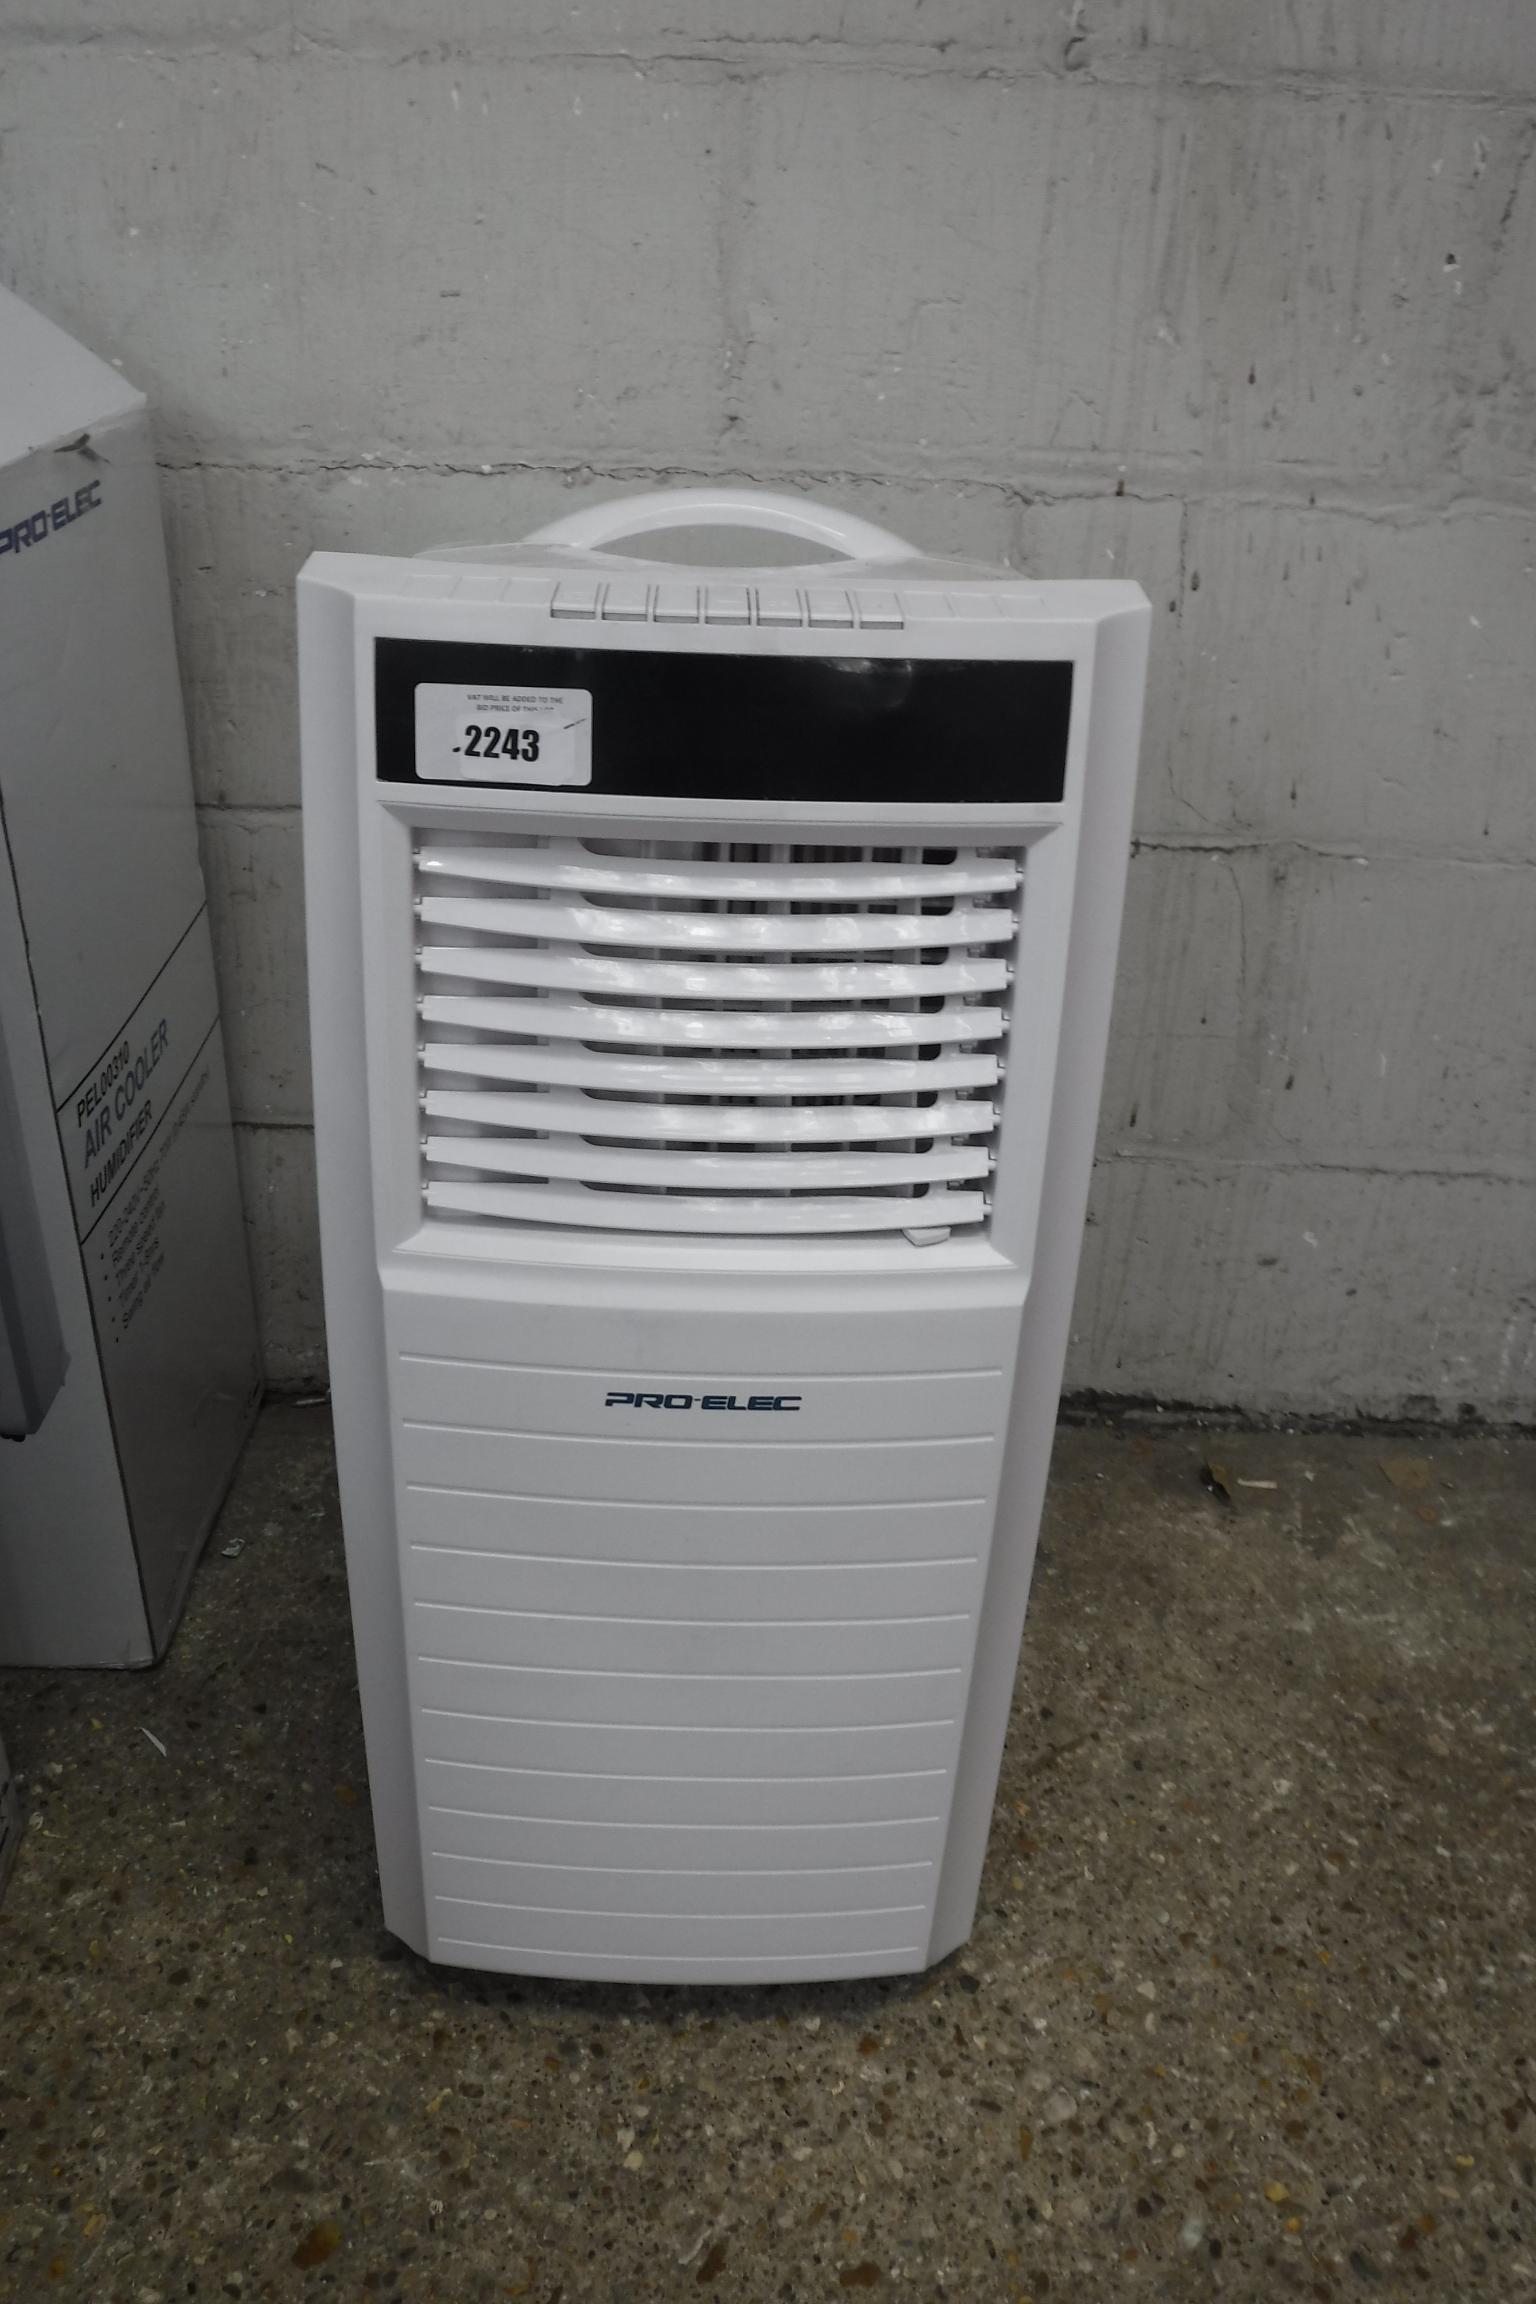 (2419) Small mobile Pro Elec PEL01200 air conditioning unit